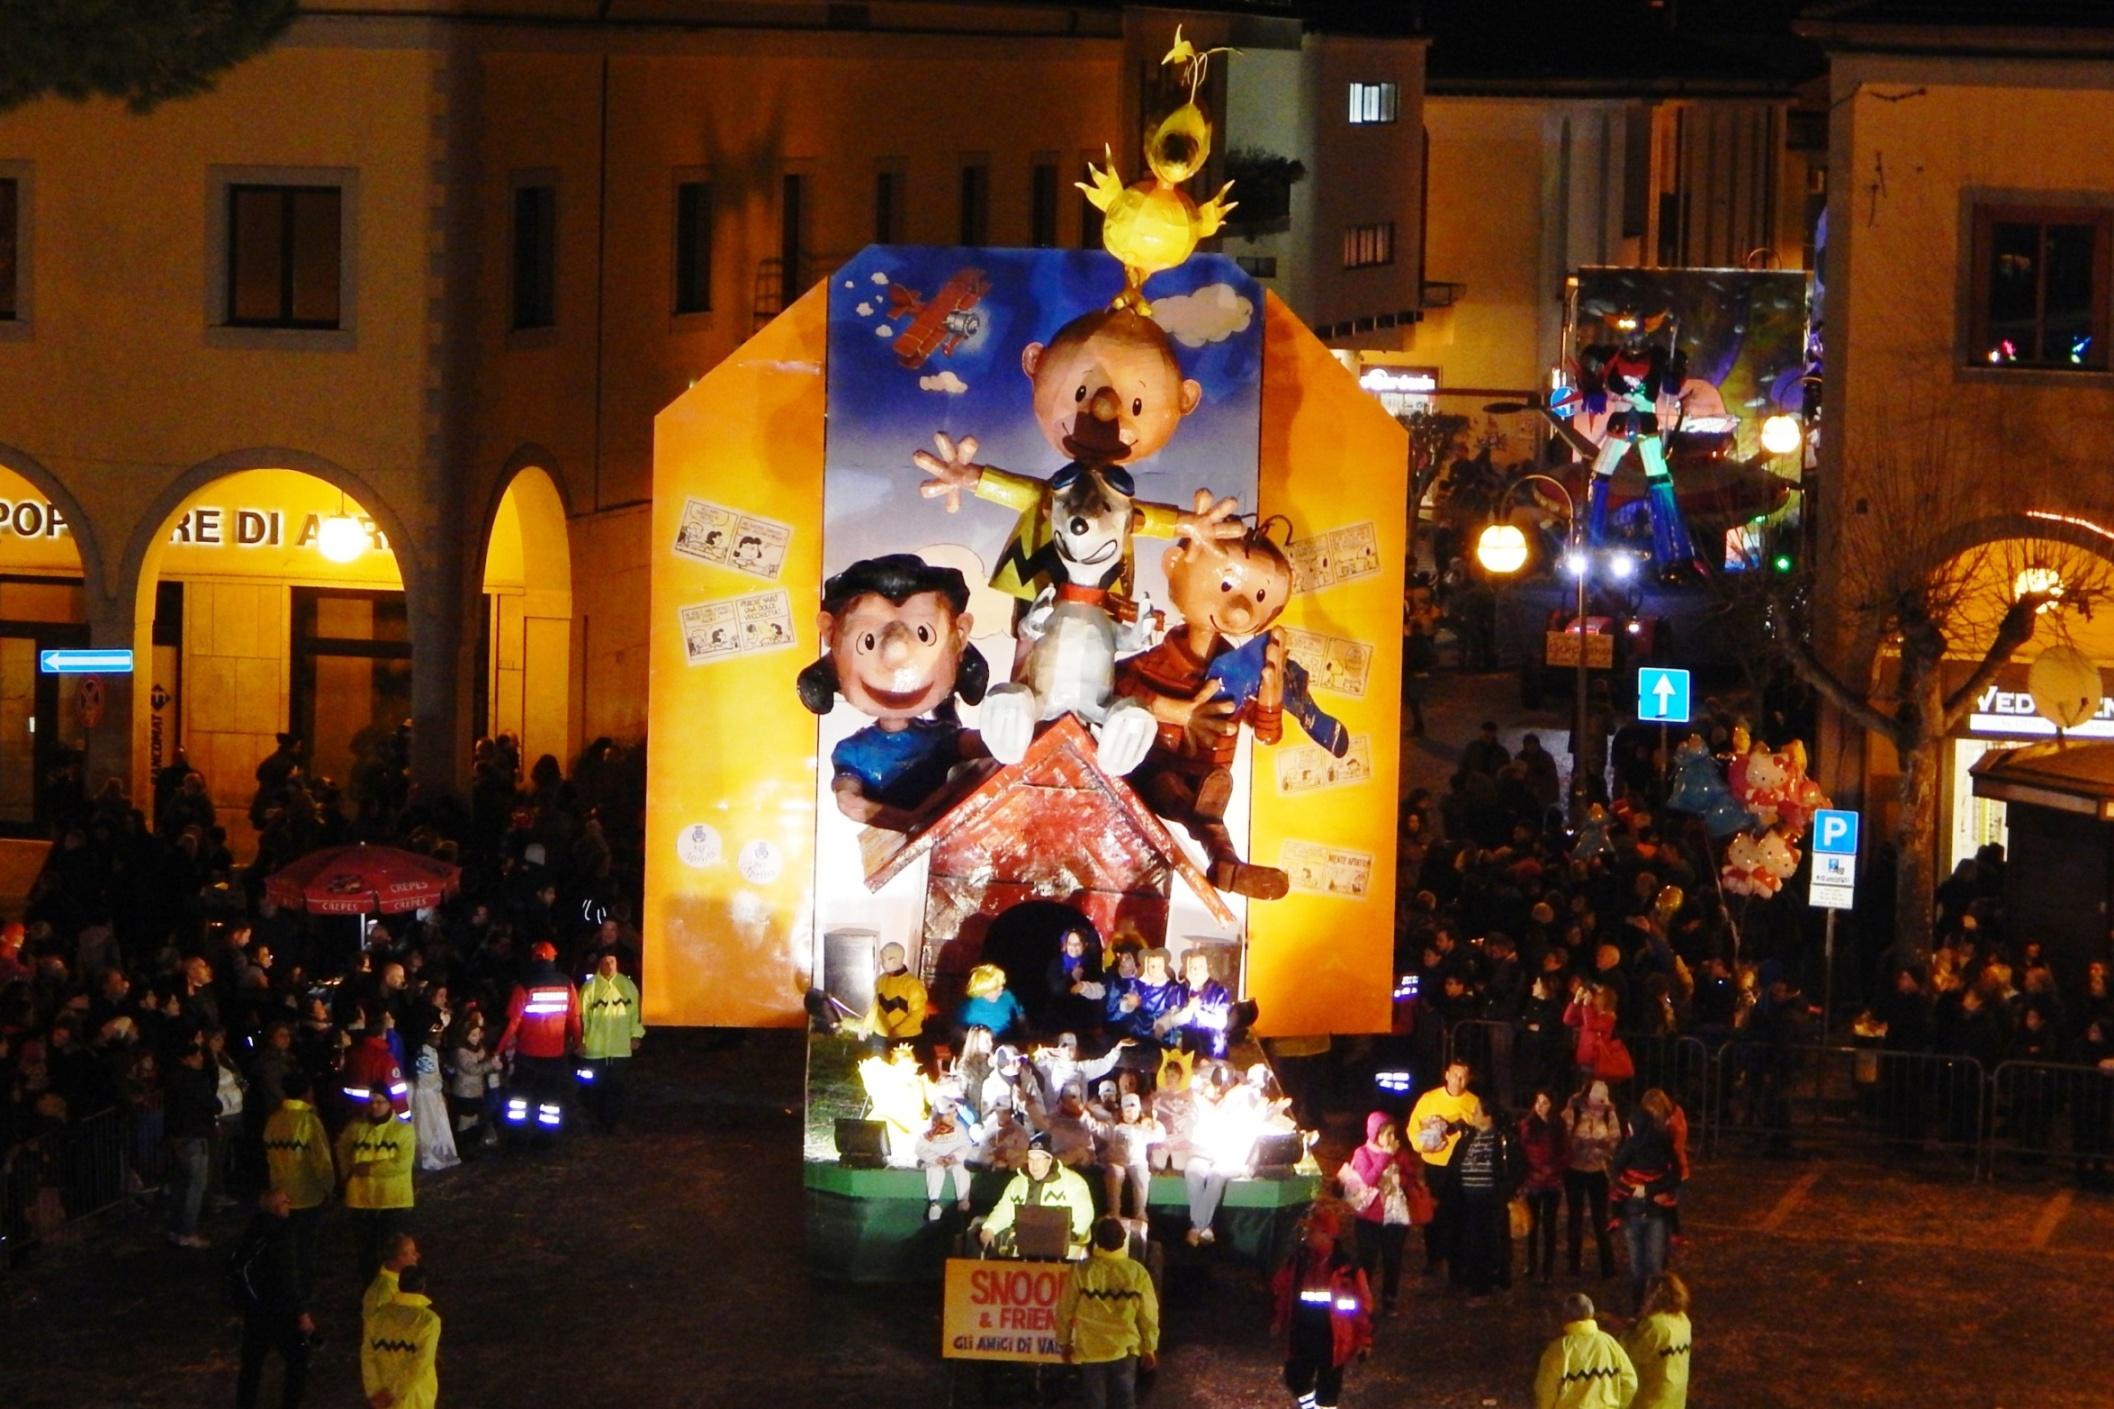 Carnevale%20Sabato%206%20febbraio%202016%20(105)